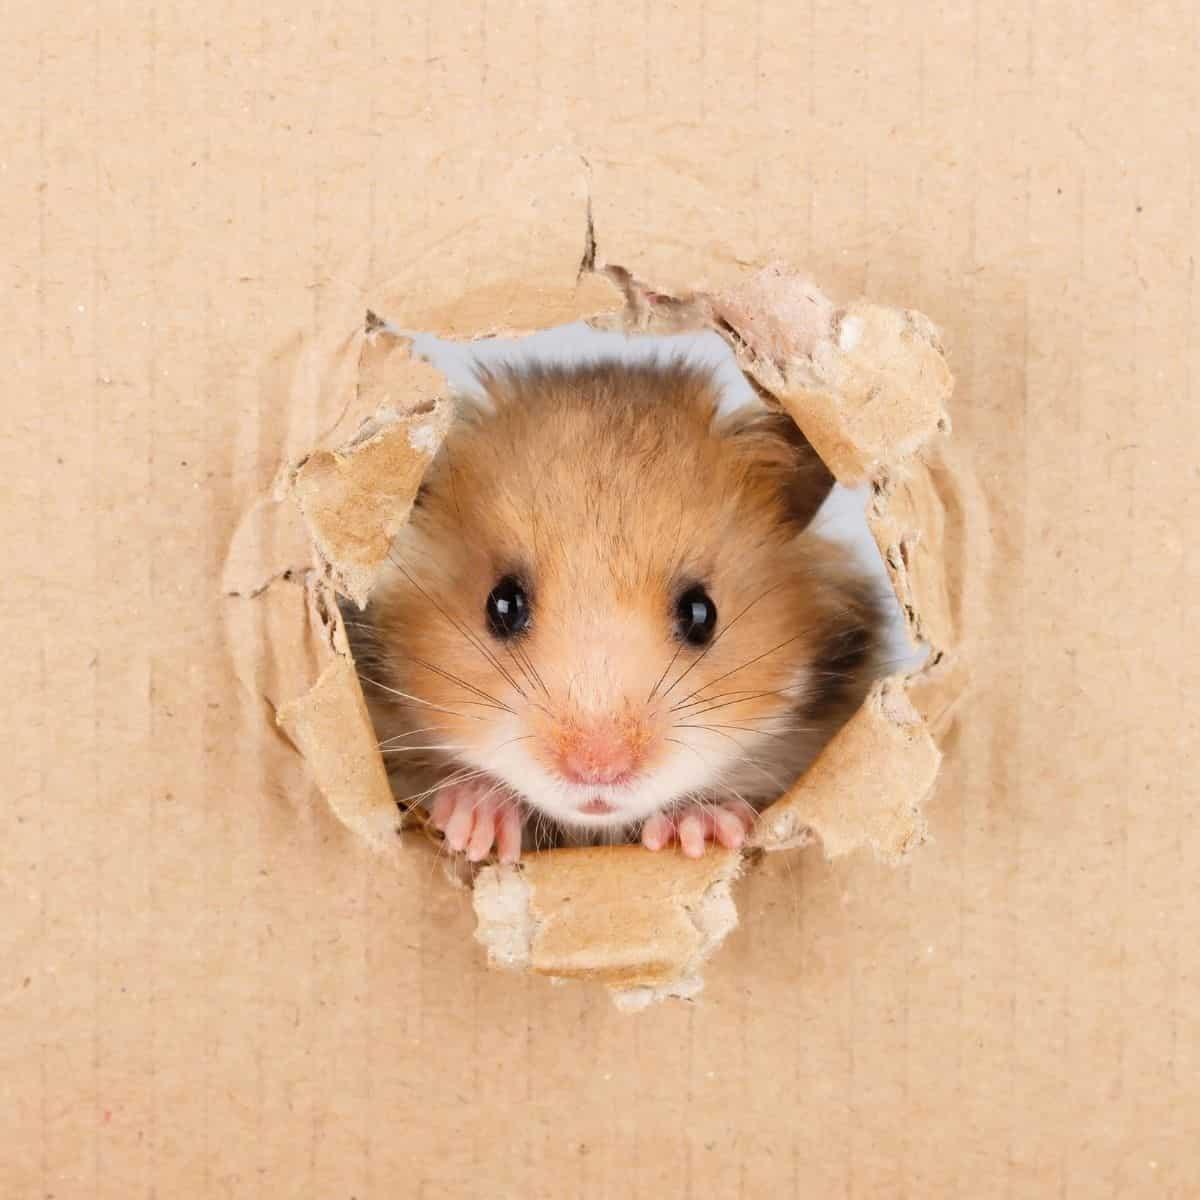 Hamster peeking through a hole in cardboard.